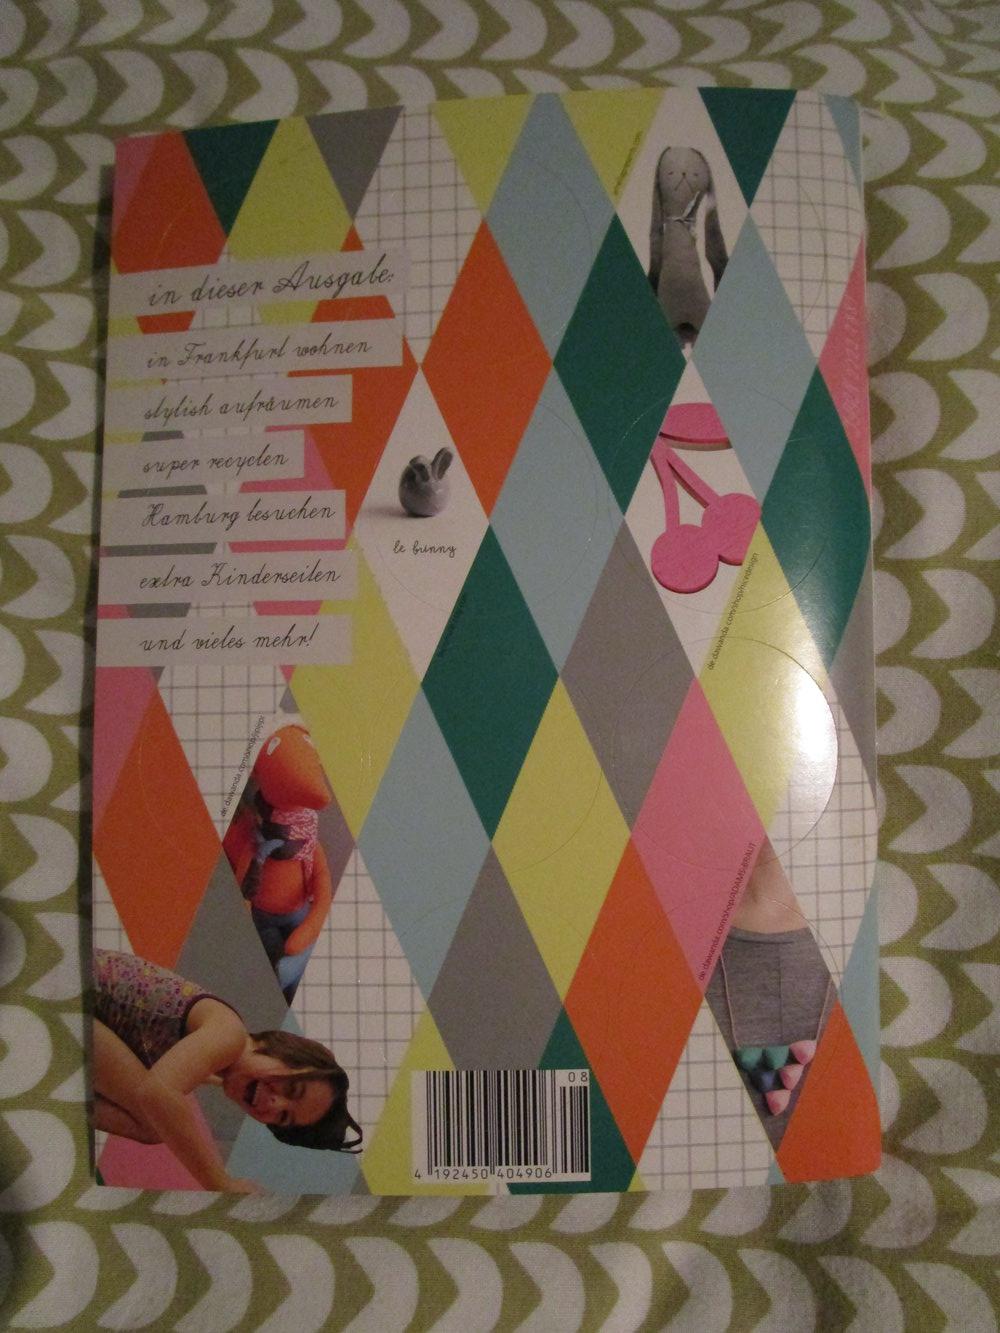 kleinformat 8 magazin zeitschrift kreative eltern diy kinder erziehung. Black Bedroom Furniture Sets. Home Design Ideas